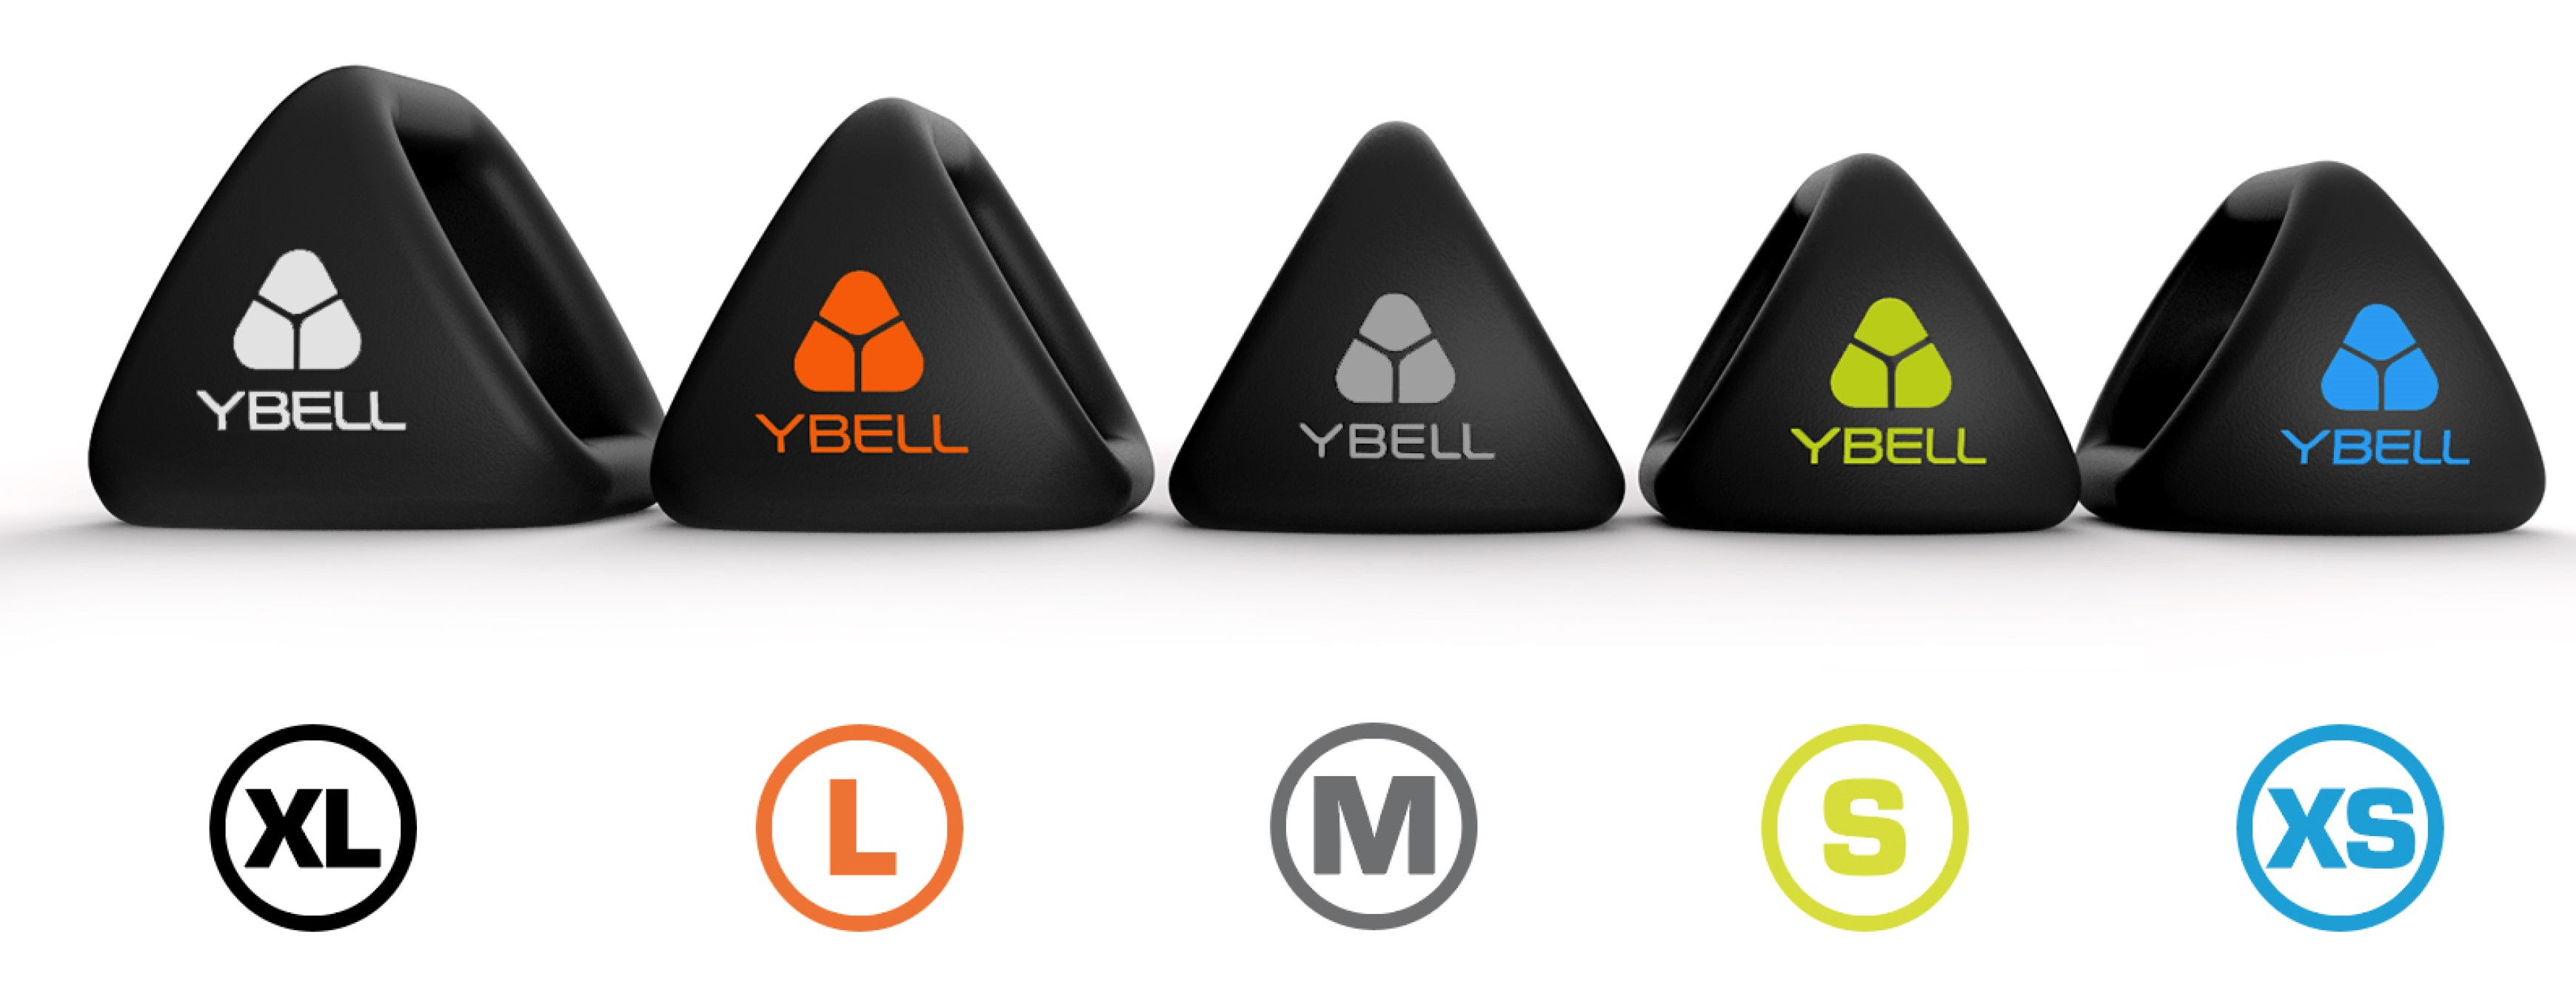 ybell-sizes.jpg